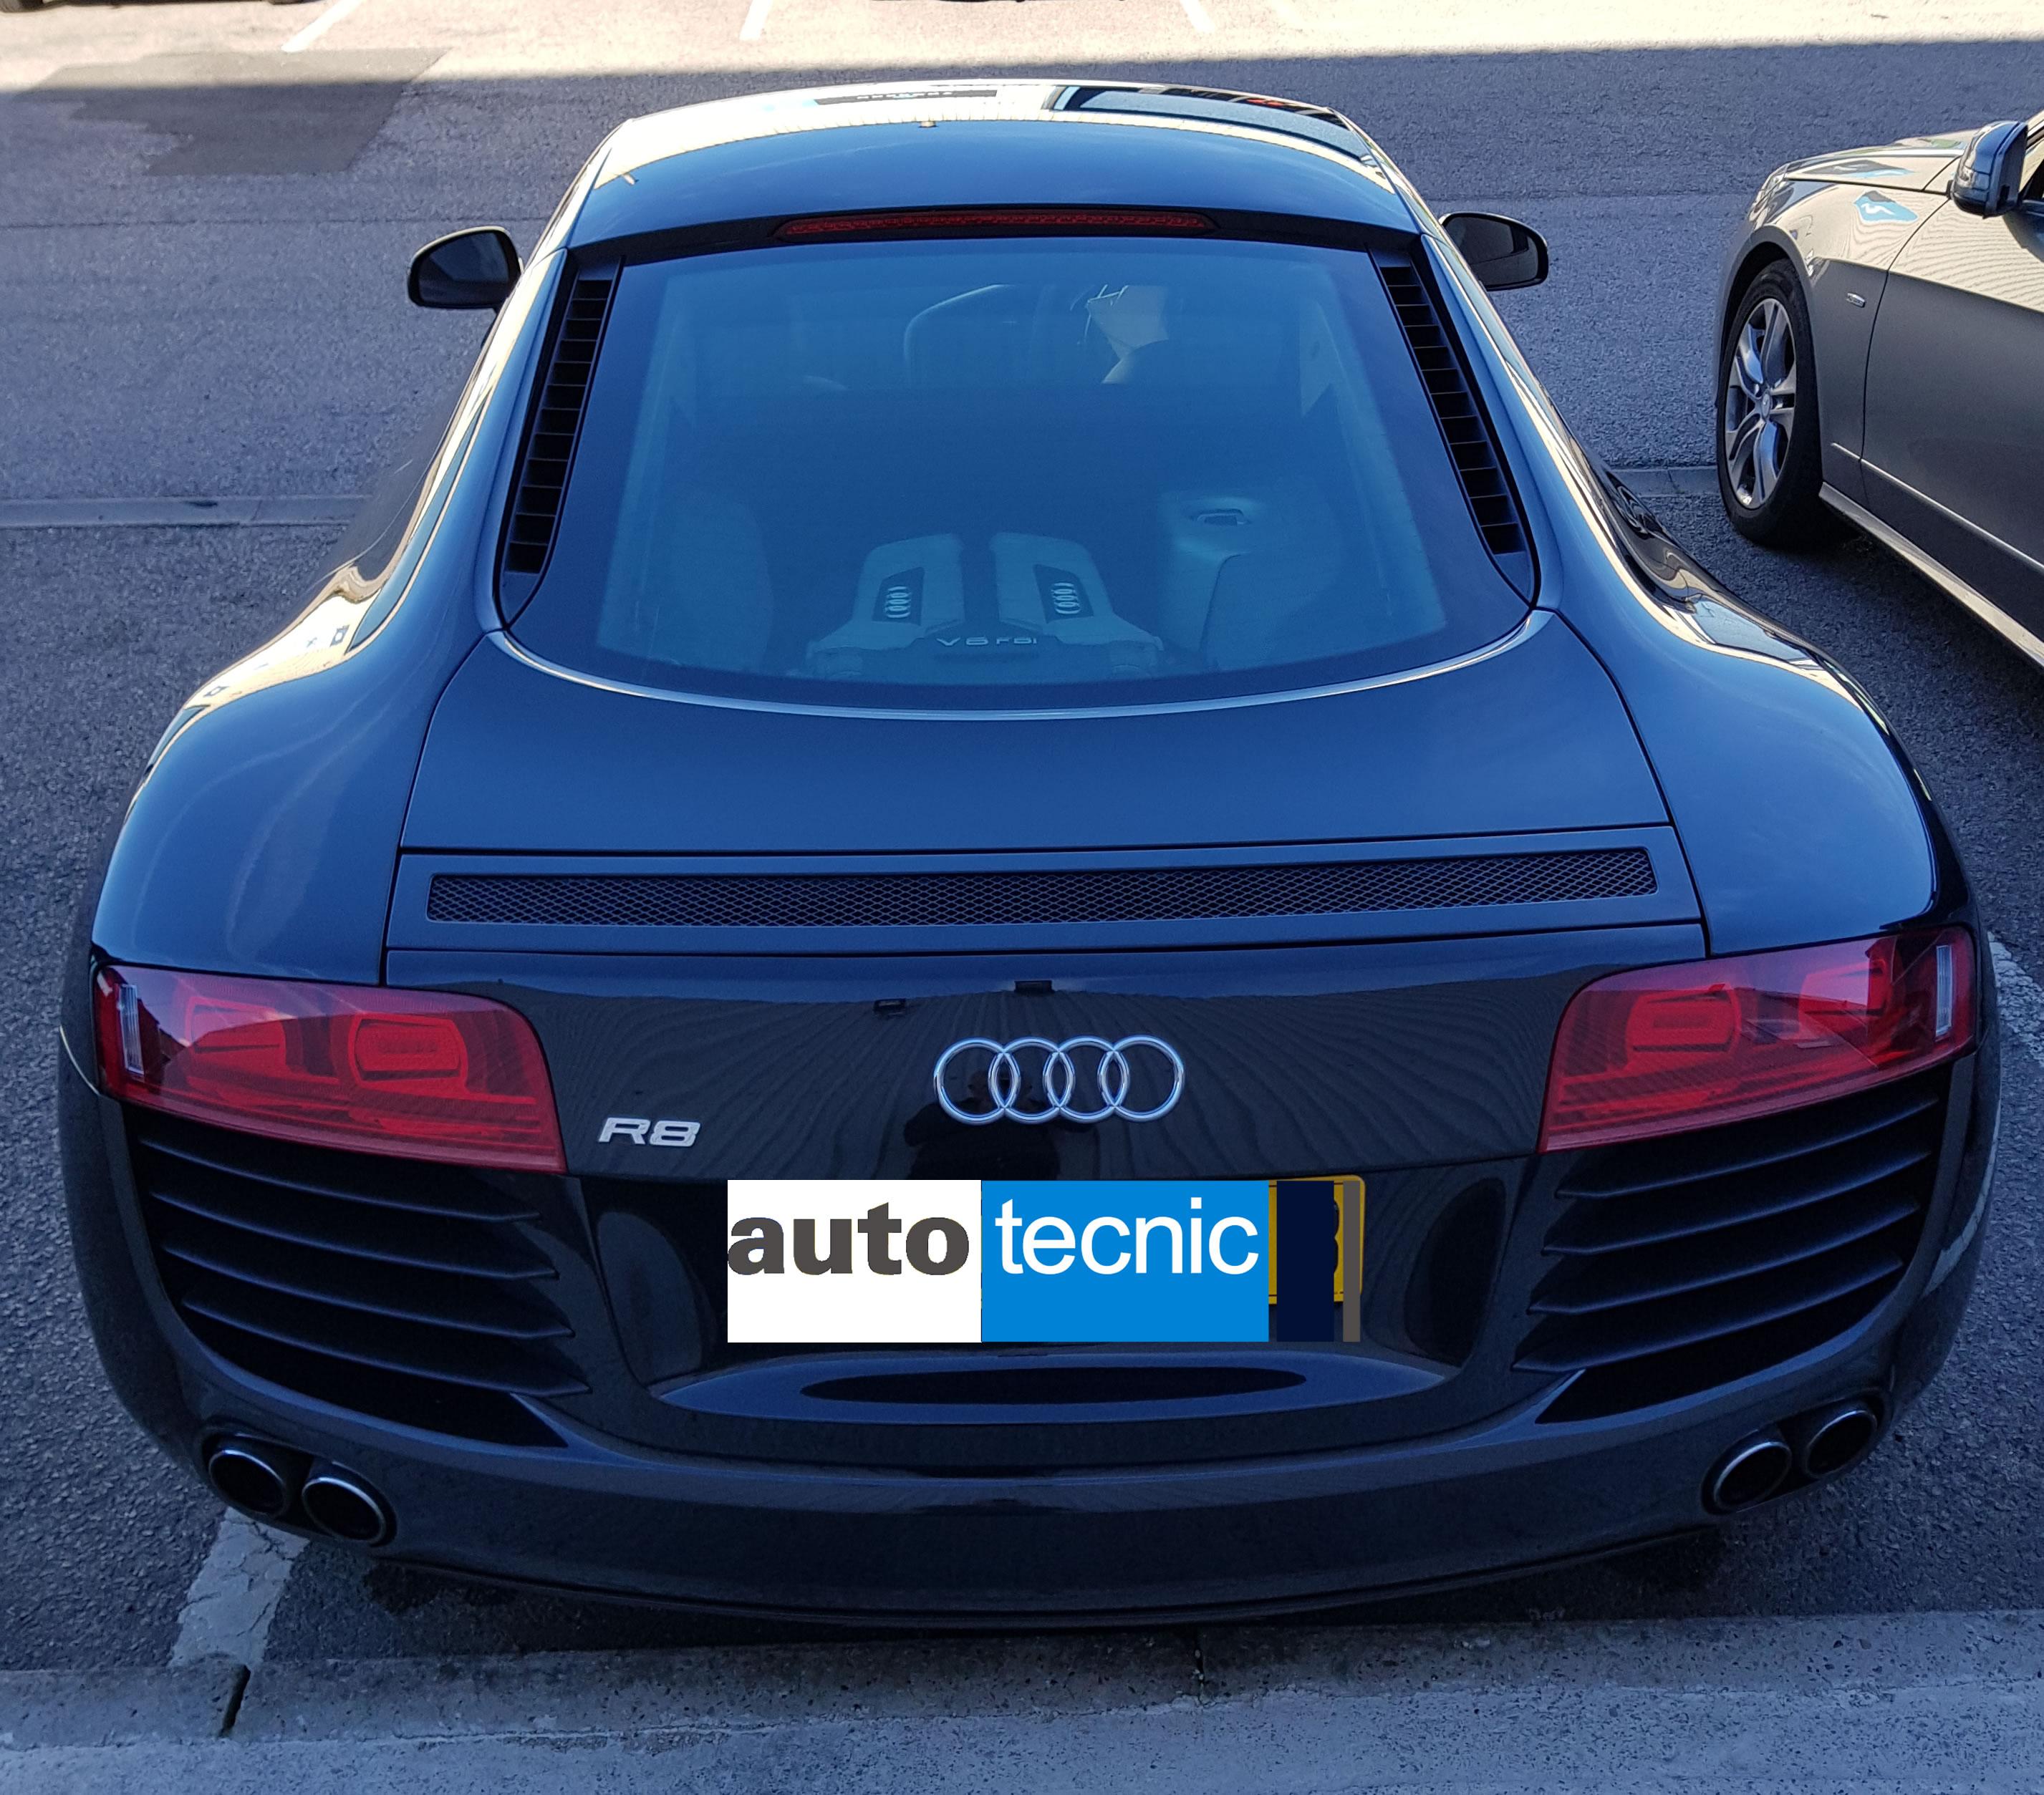 autotecnic - Audi R8